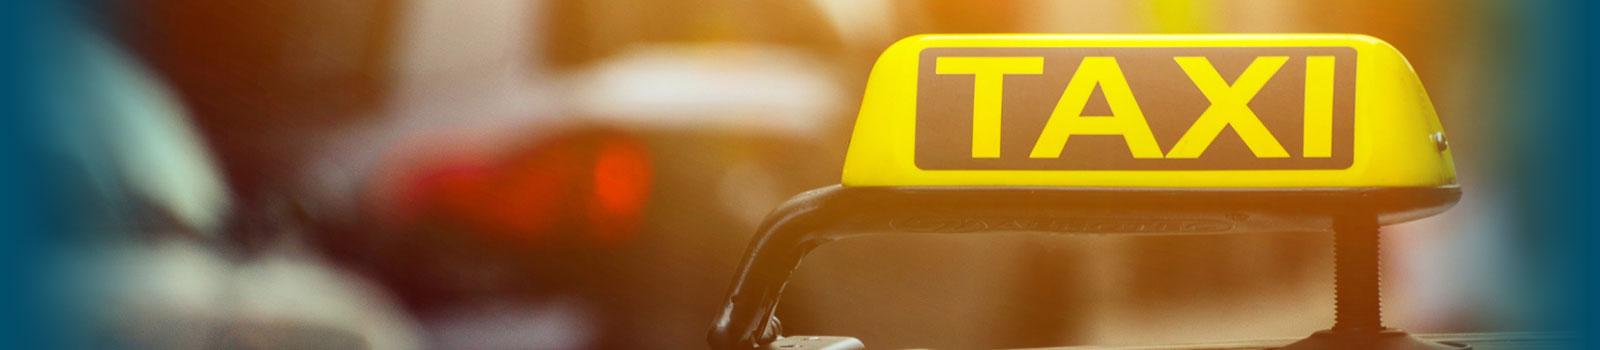 header-taxi